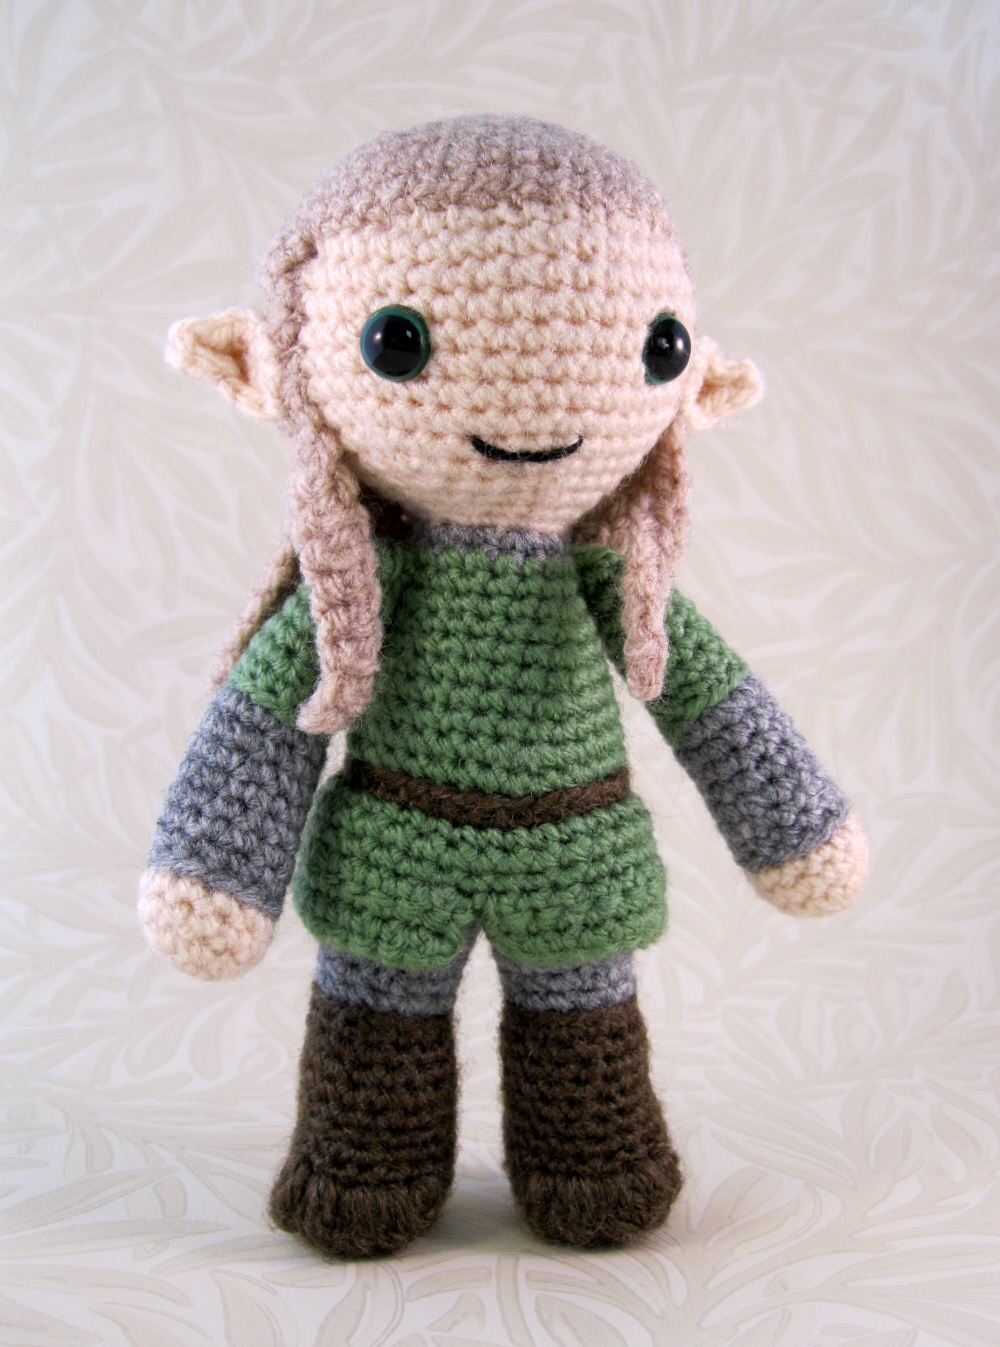 Christmas Crochet Elf Doll Amigurumi Patterns | 1347x1000